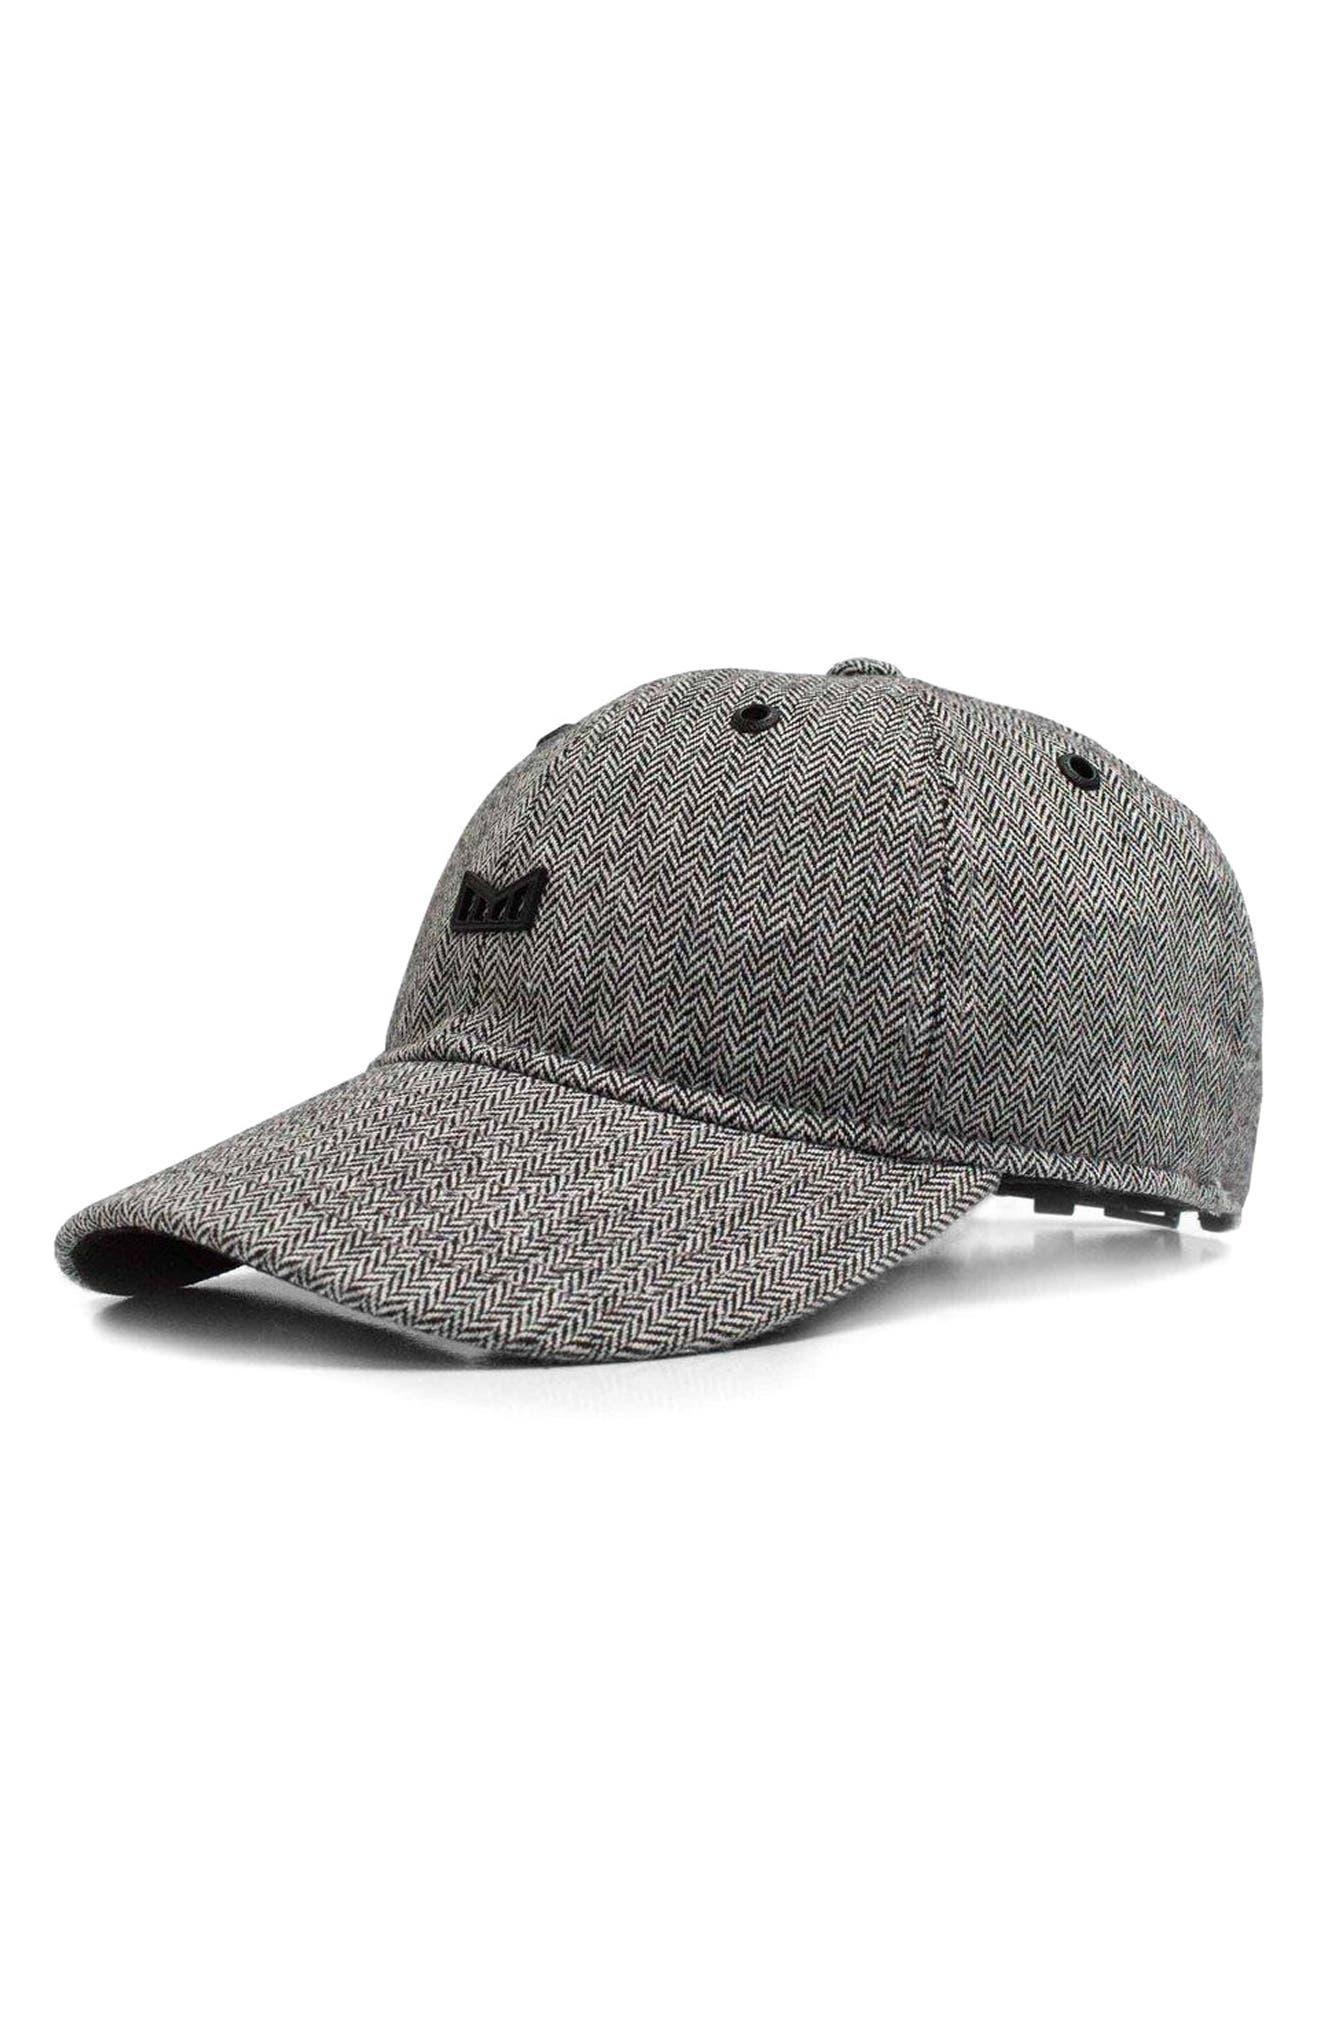 Melin Skunked Baseball Cap